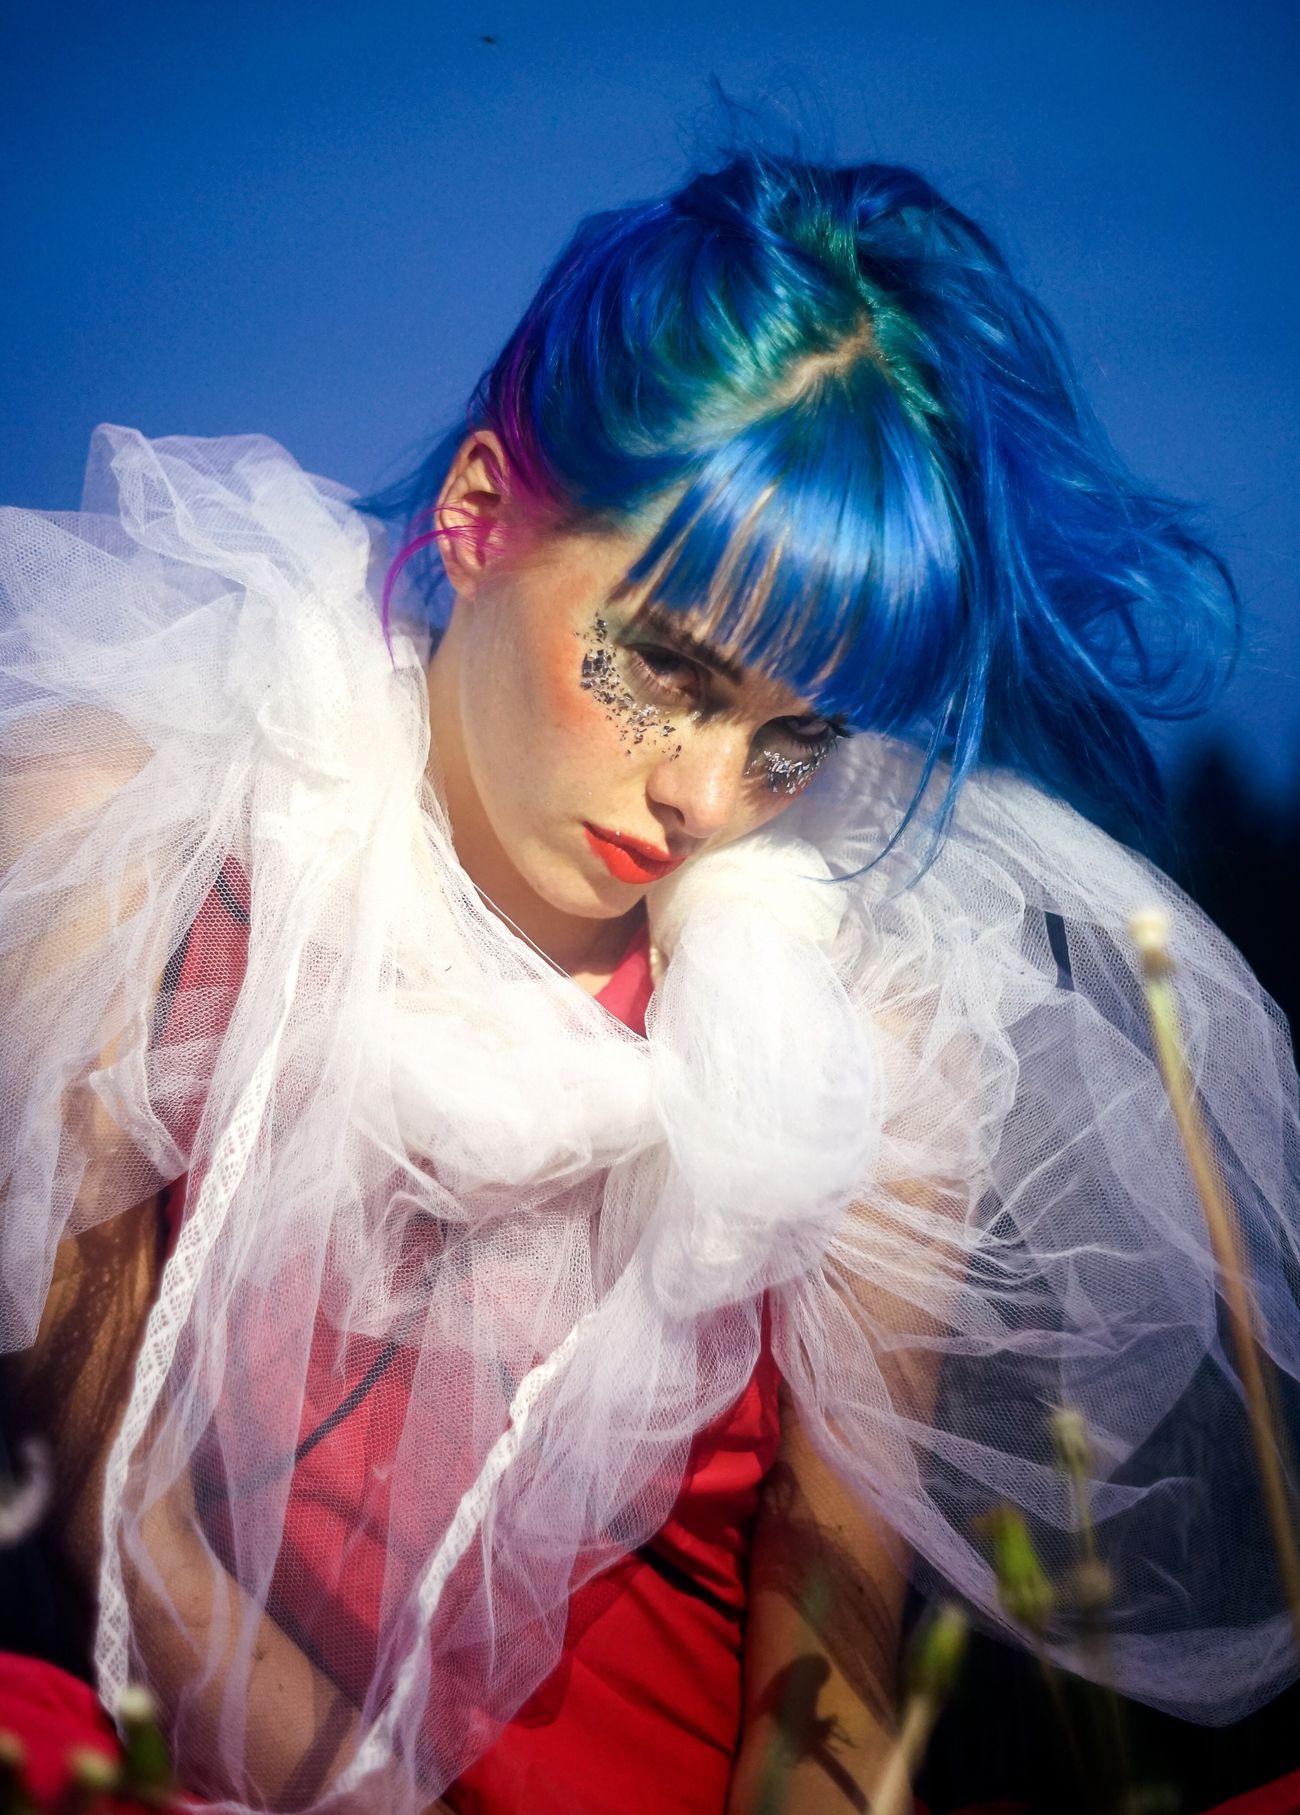 80's flirt. Young Women Beautiful Woman Tutu BlueHair Portrait Eighties Sonyalpha Sonyalpha7ii Sweden Norrtälje